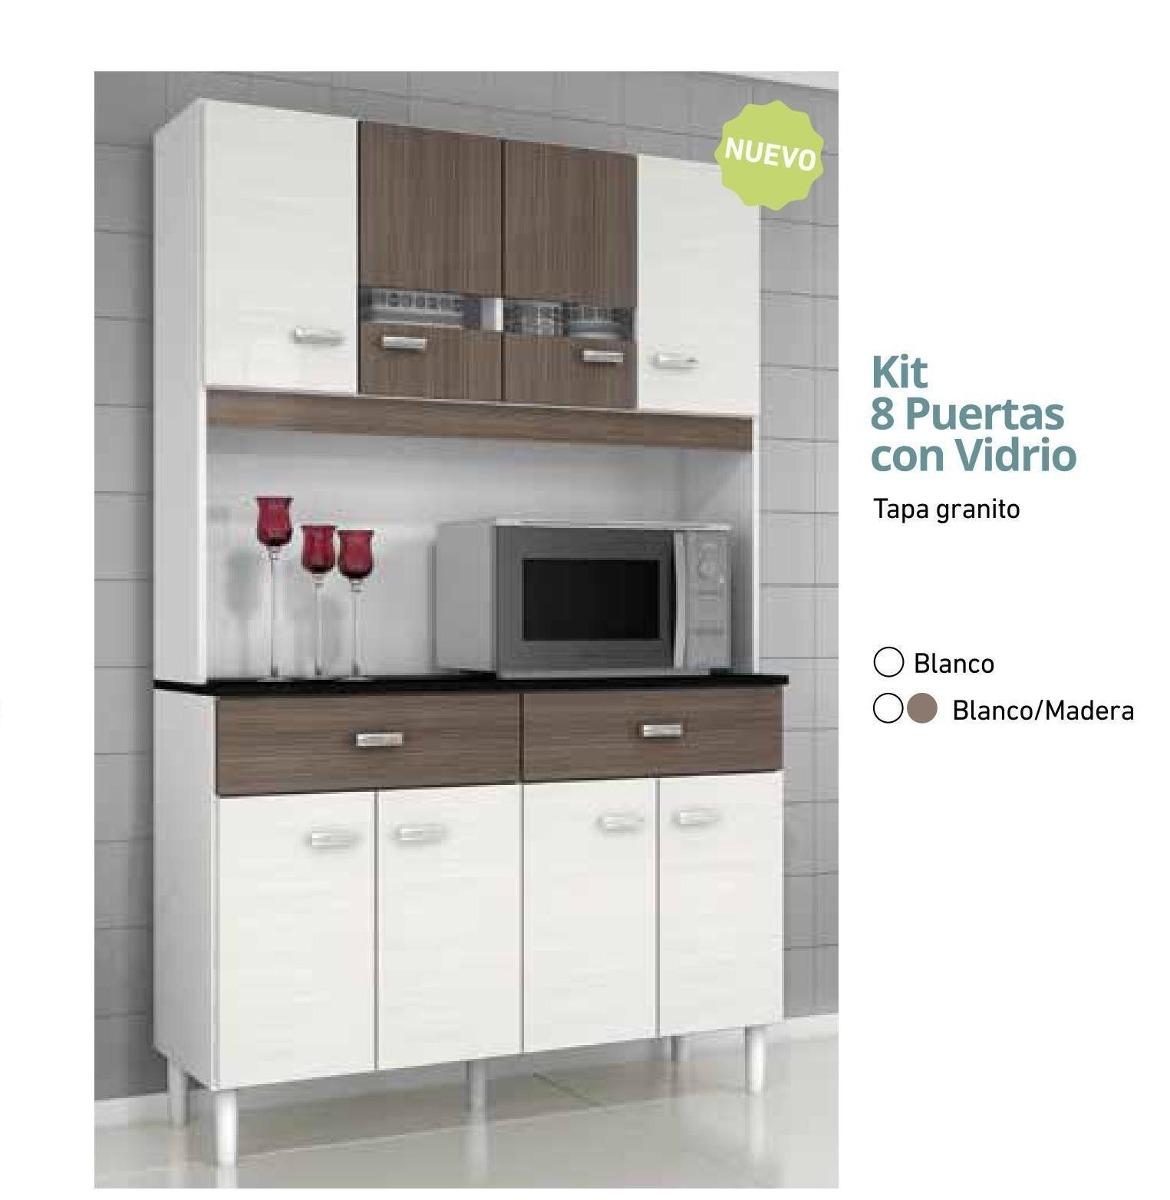 Muebles cocina kit baratos 20170814025248 for Transporte de muebles barato